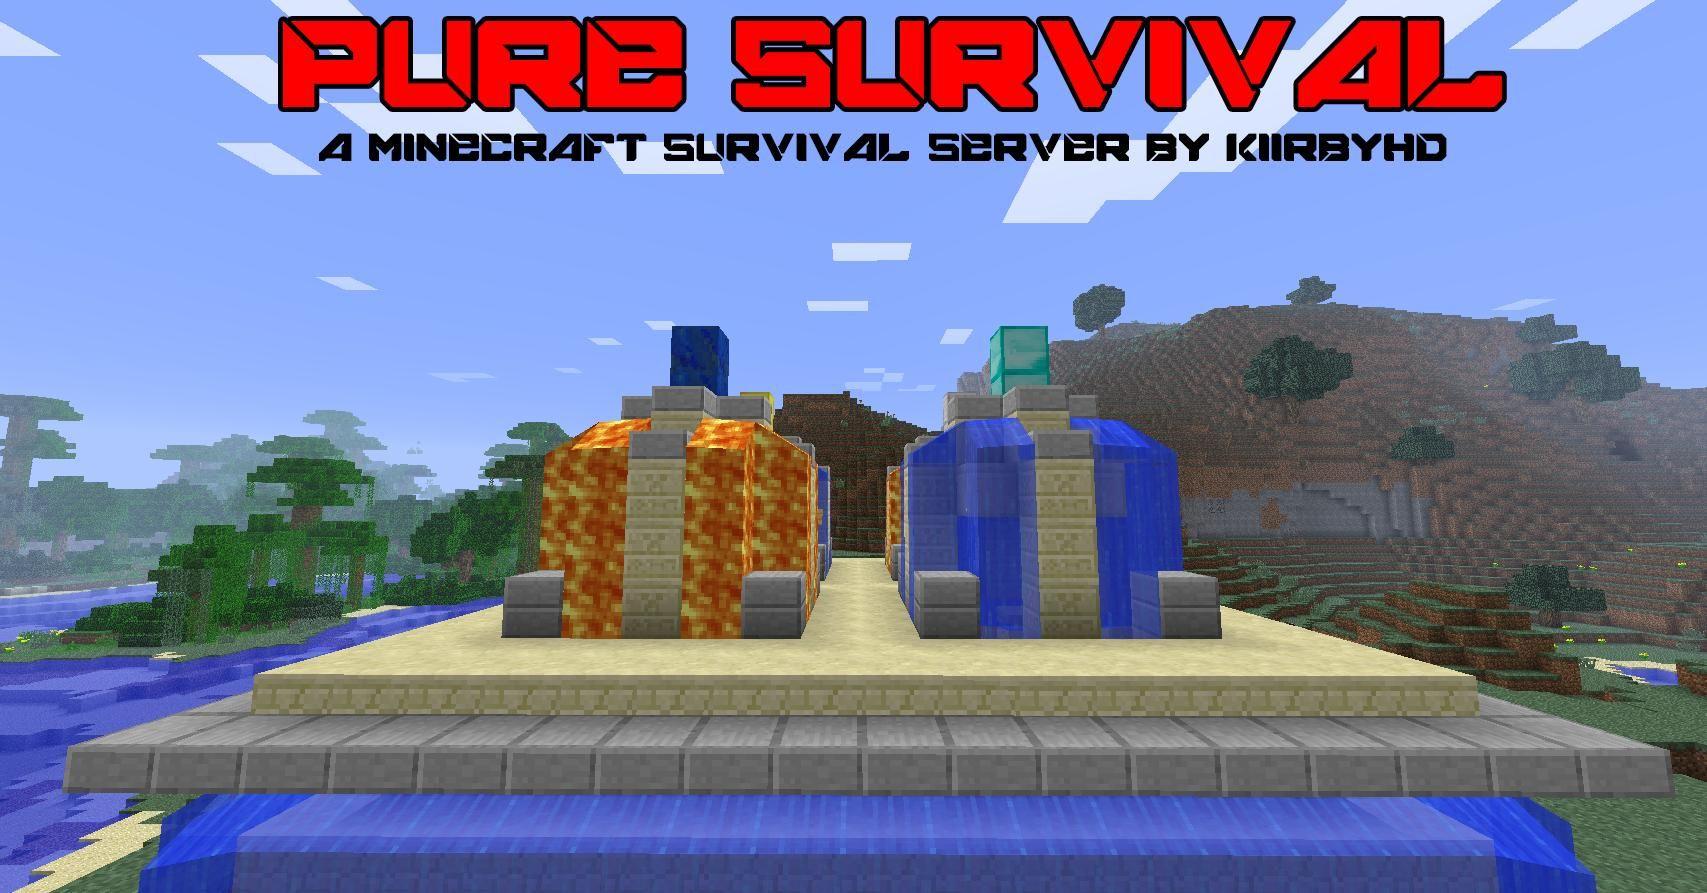 Minecraft Servers Survival  How to play minecraft, Minecraft